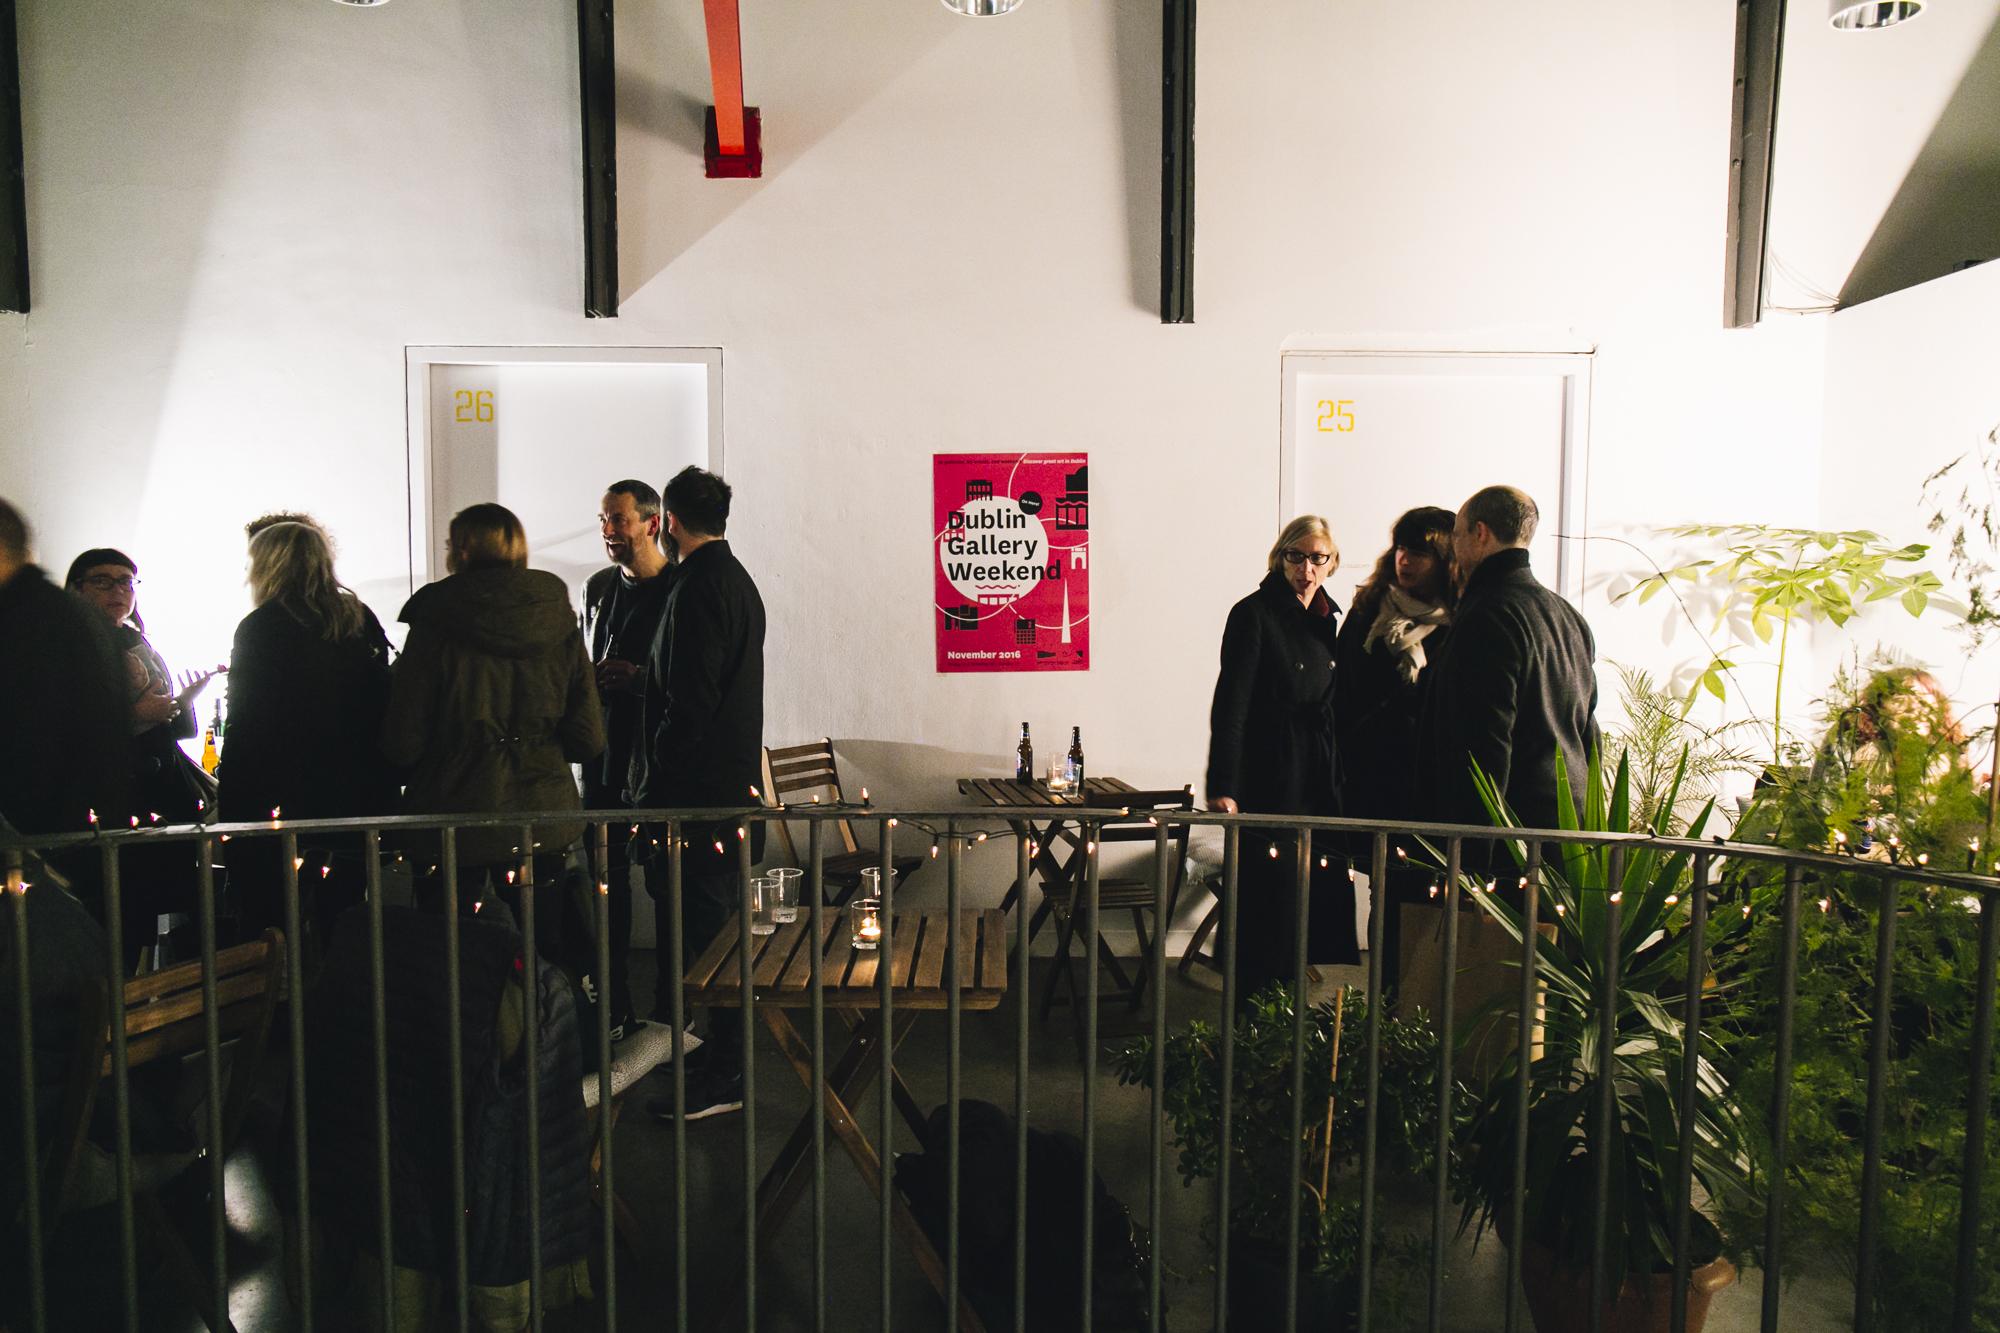 Dublin Gallery Weekend 2016: Dublin Gallery Weekend Social